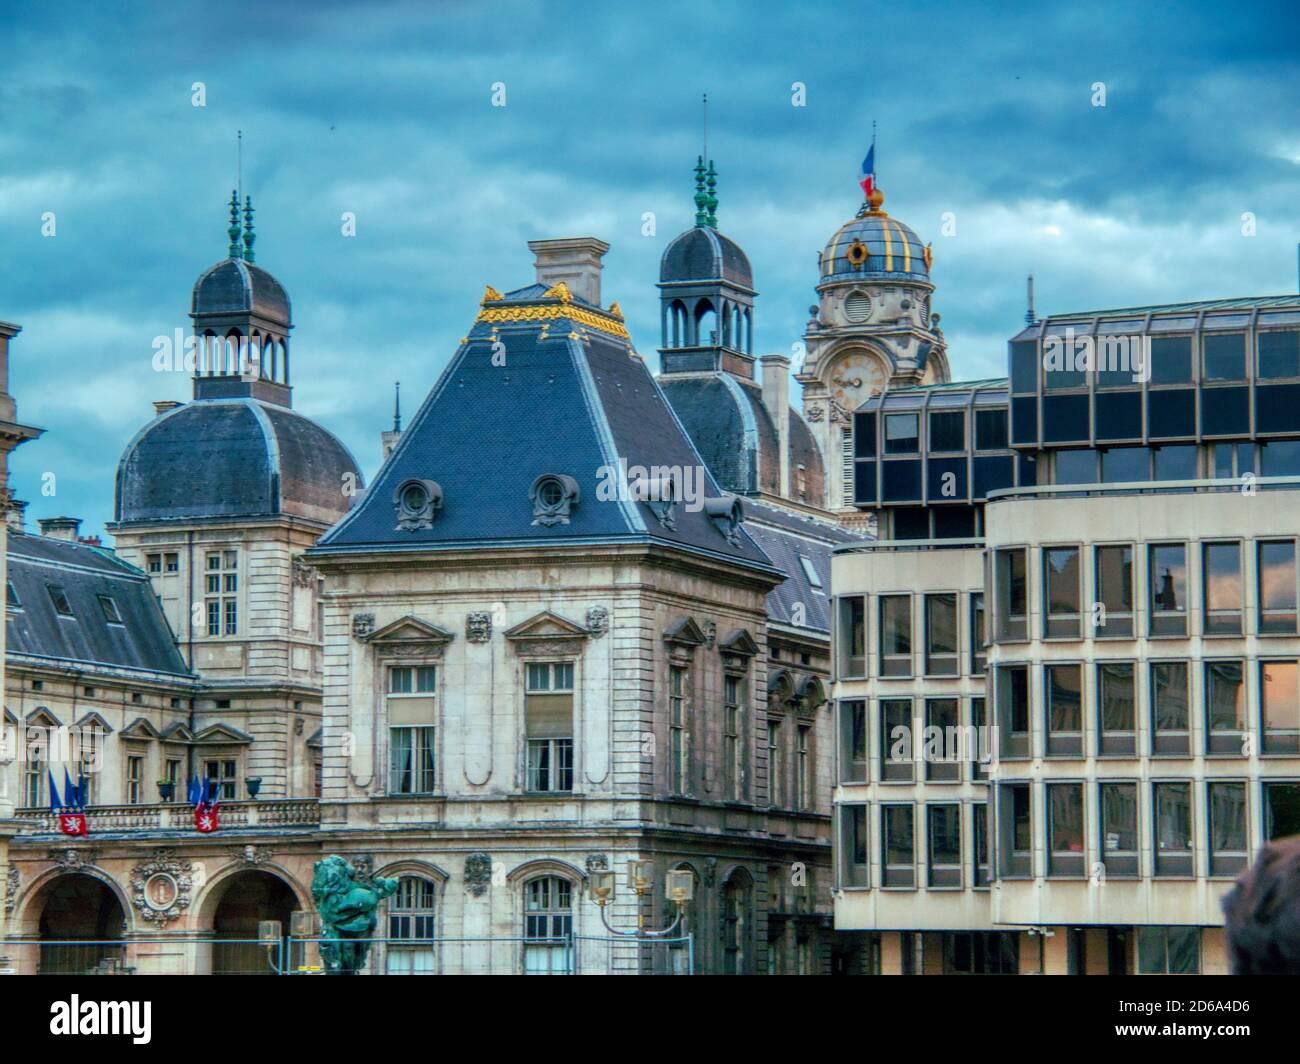 Techos, Lyon, Auvergne-Rh'ne-Alpes, Francia. Foto de stock